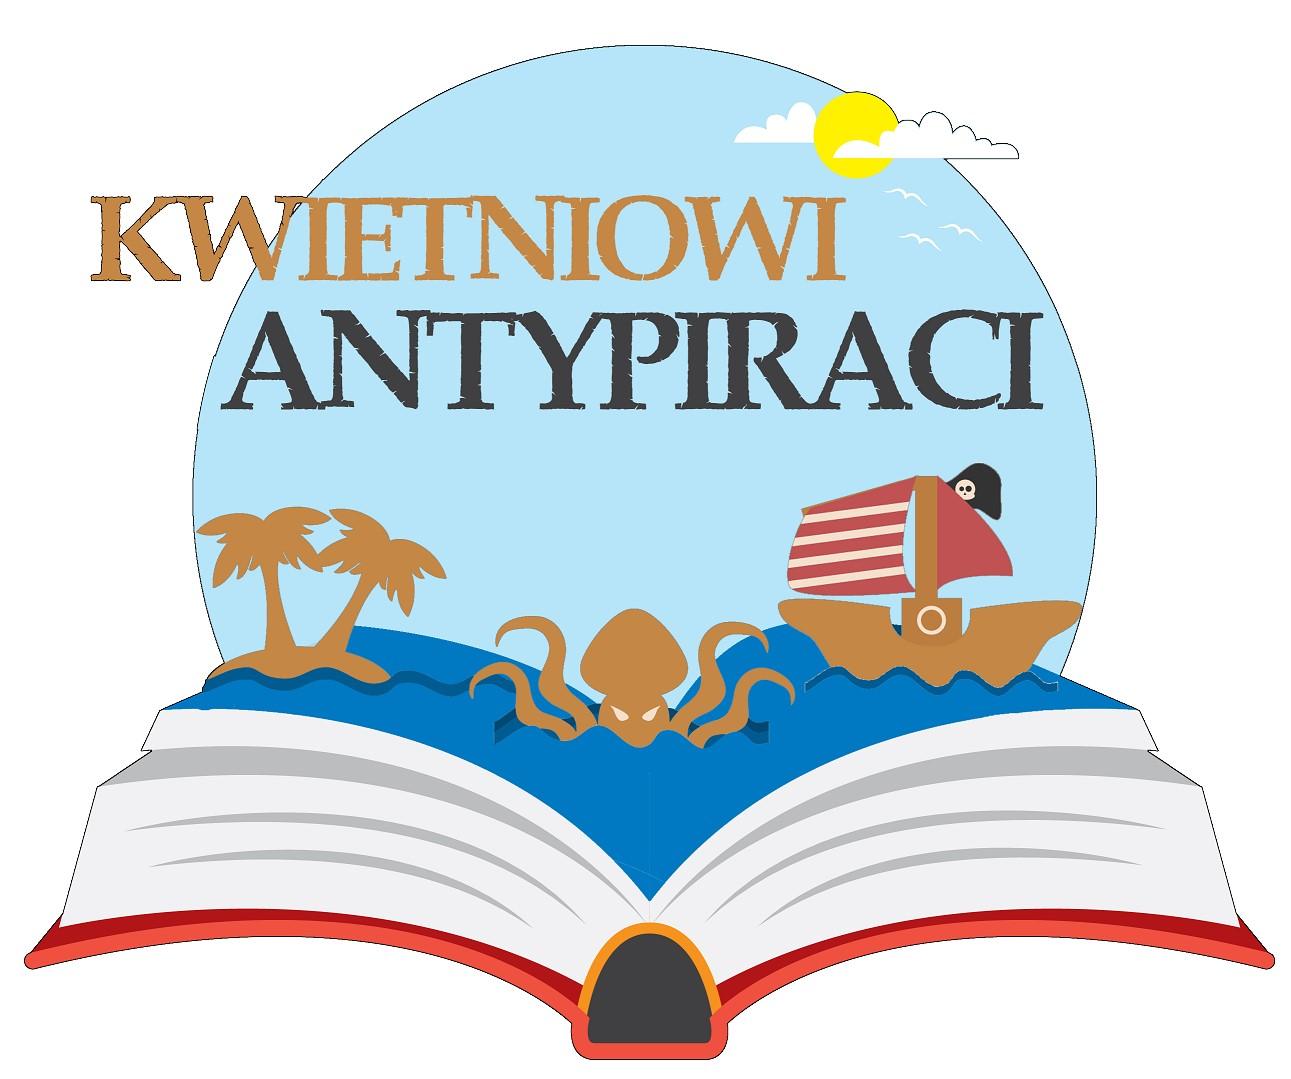 Kwietniowi antypiraci logo